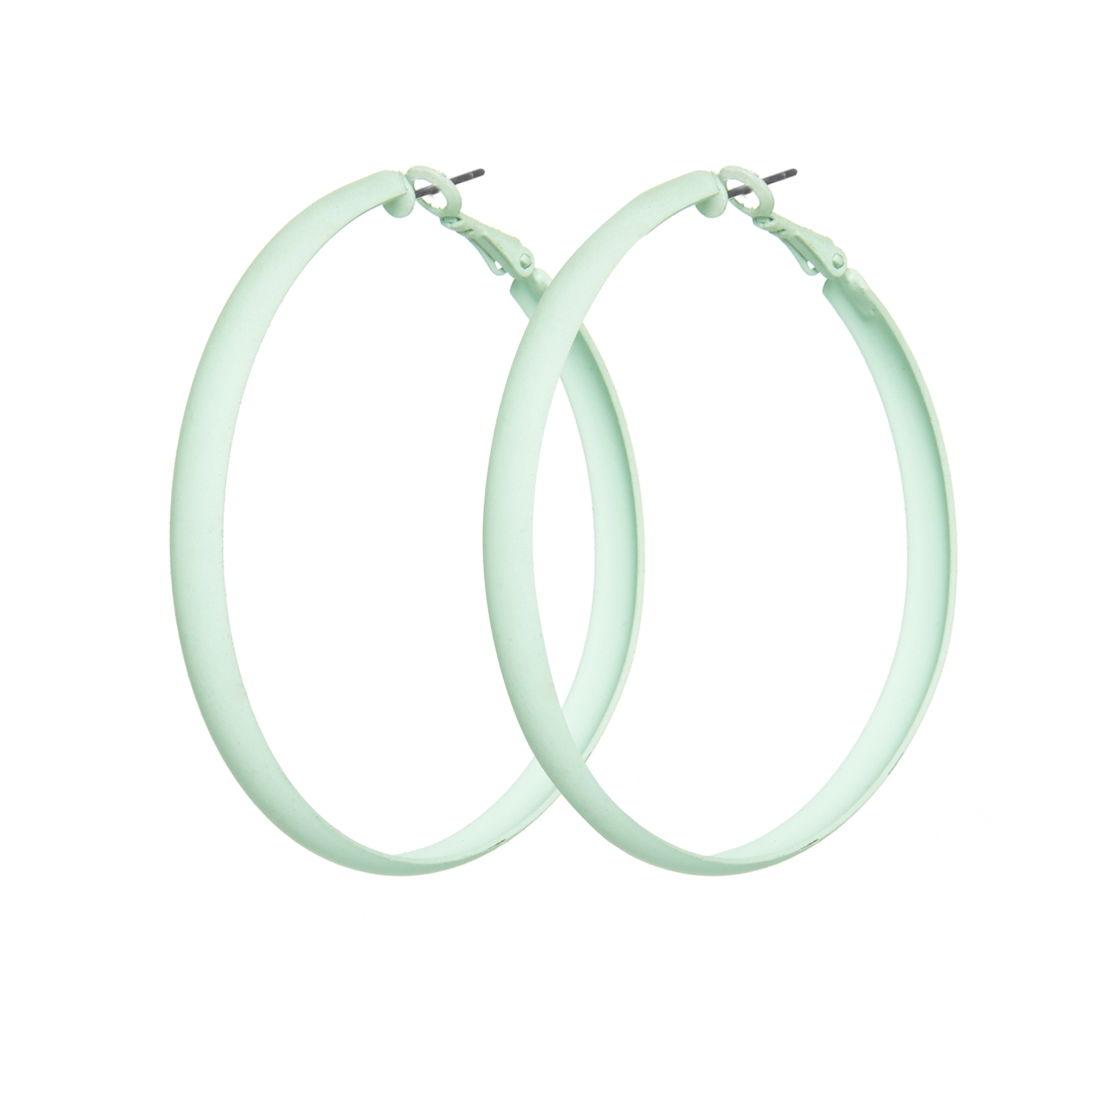 Primark - Matte Mint Hoop Earrings - 2€